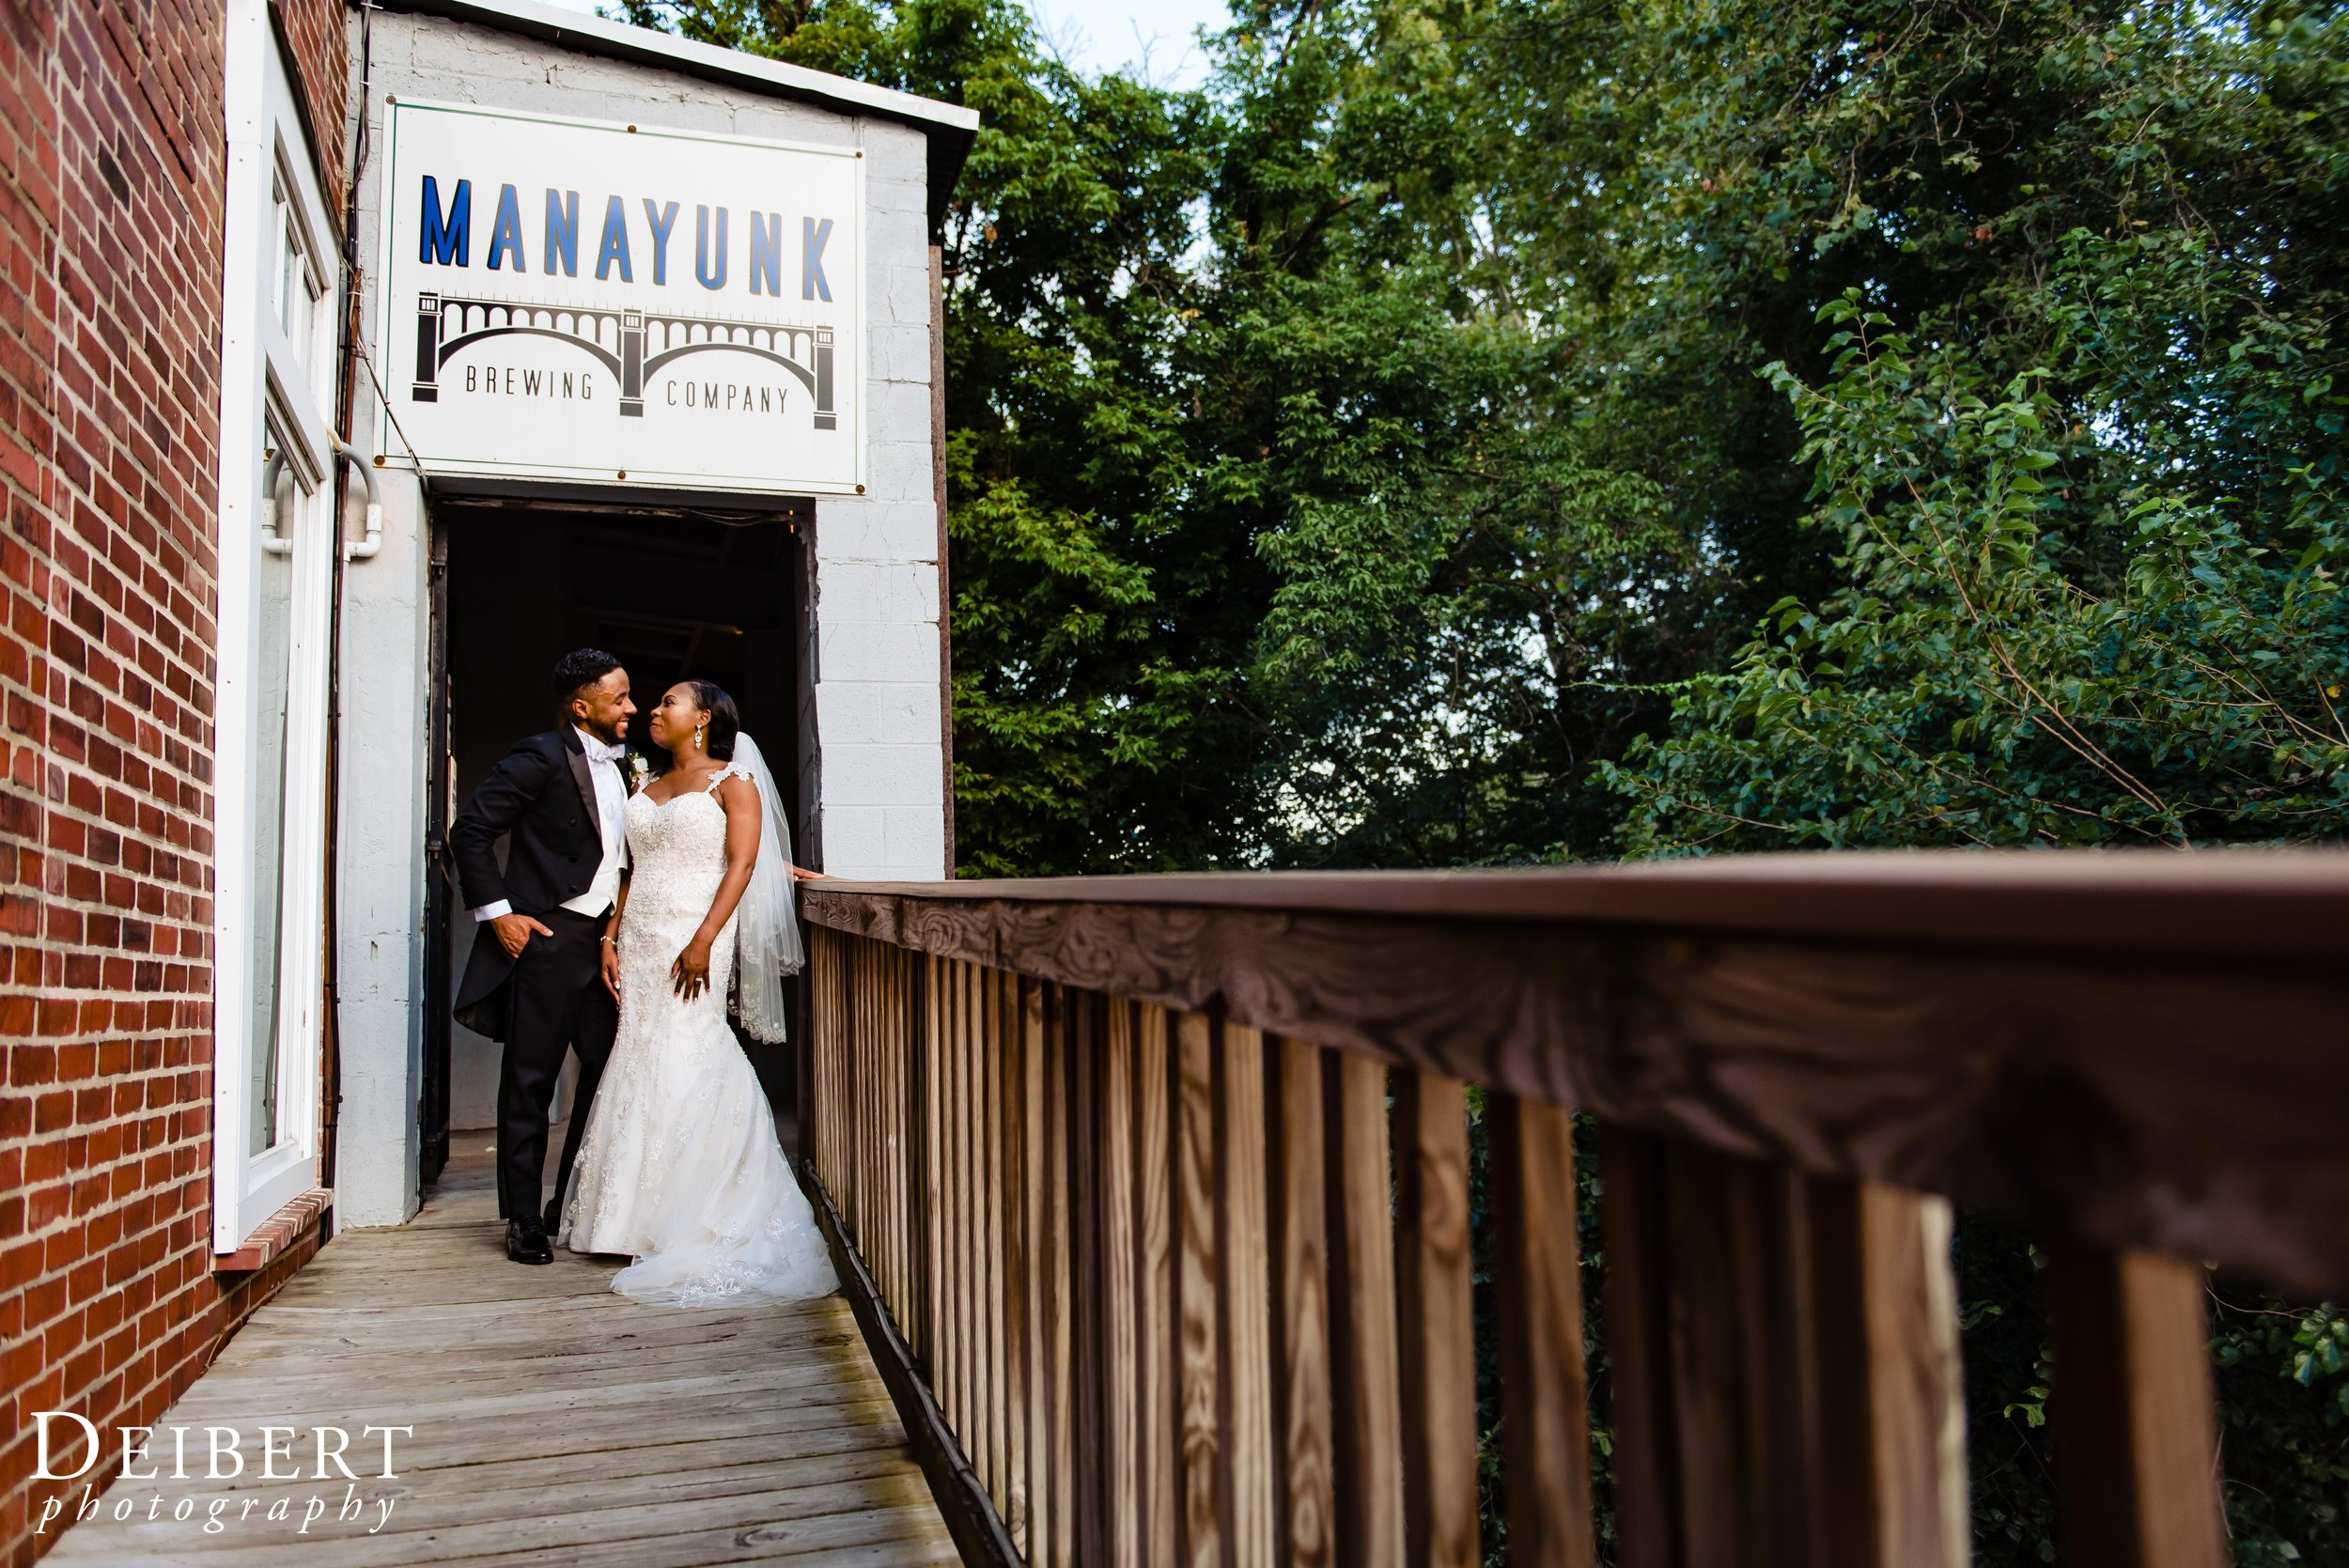 Manayunk Brewery Wedding-10.jpg